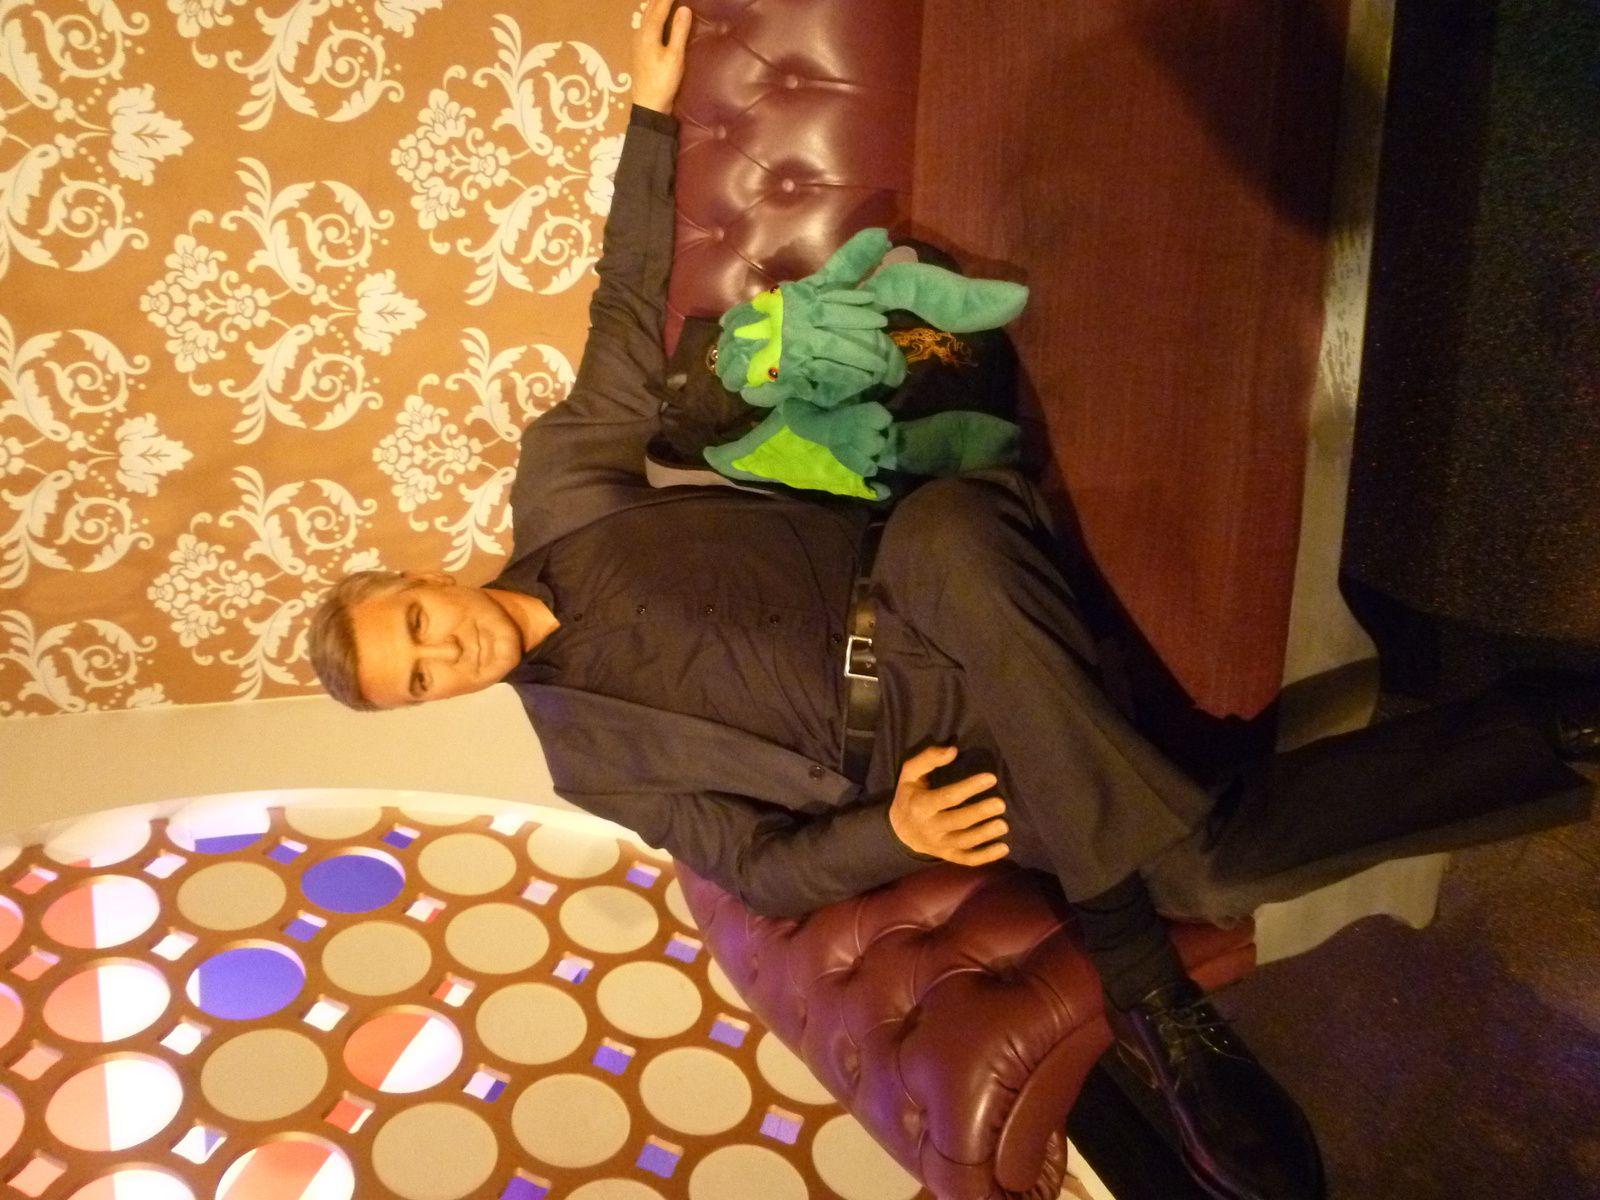 Cthulhu tente d'engager la conversation avec George Clooney...